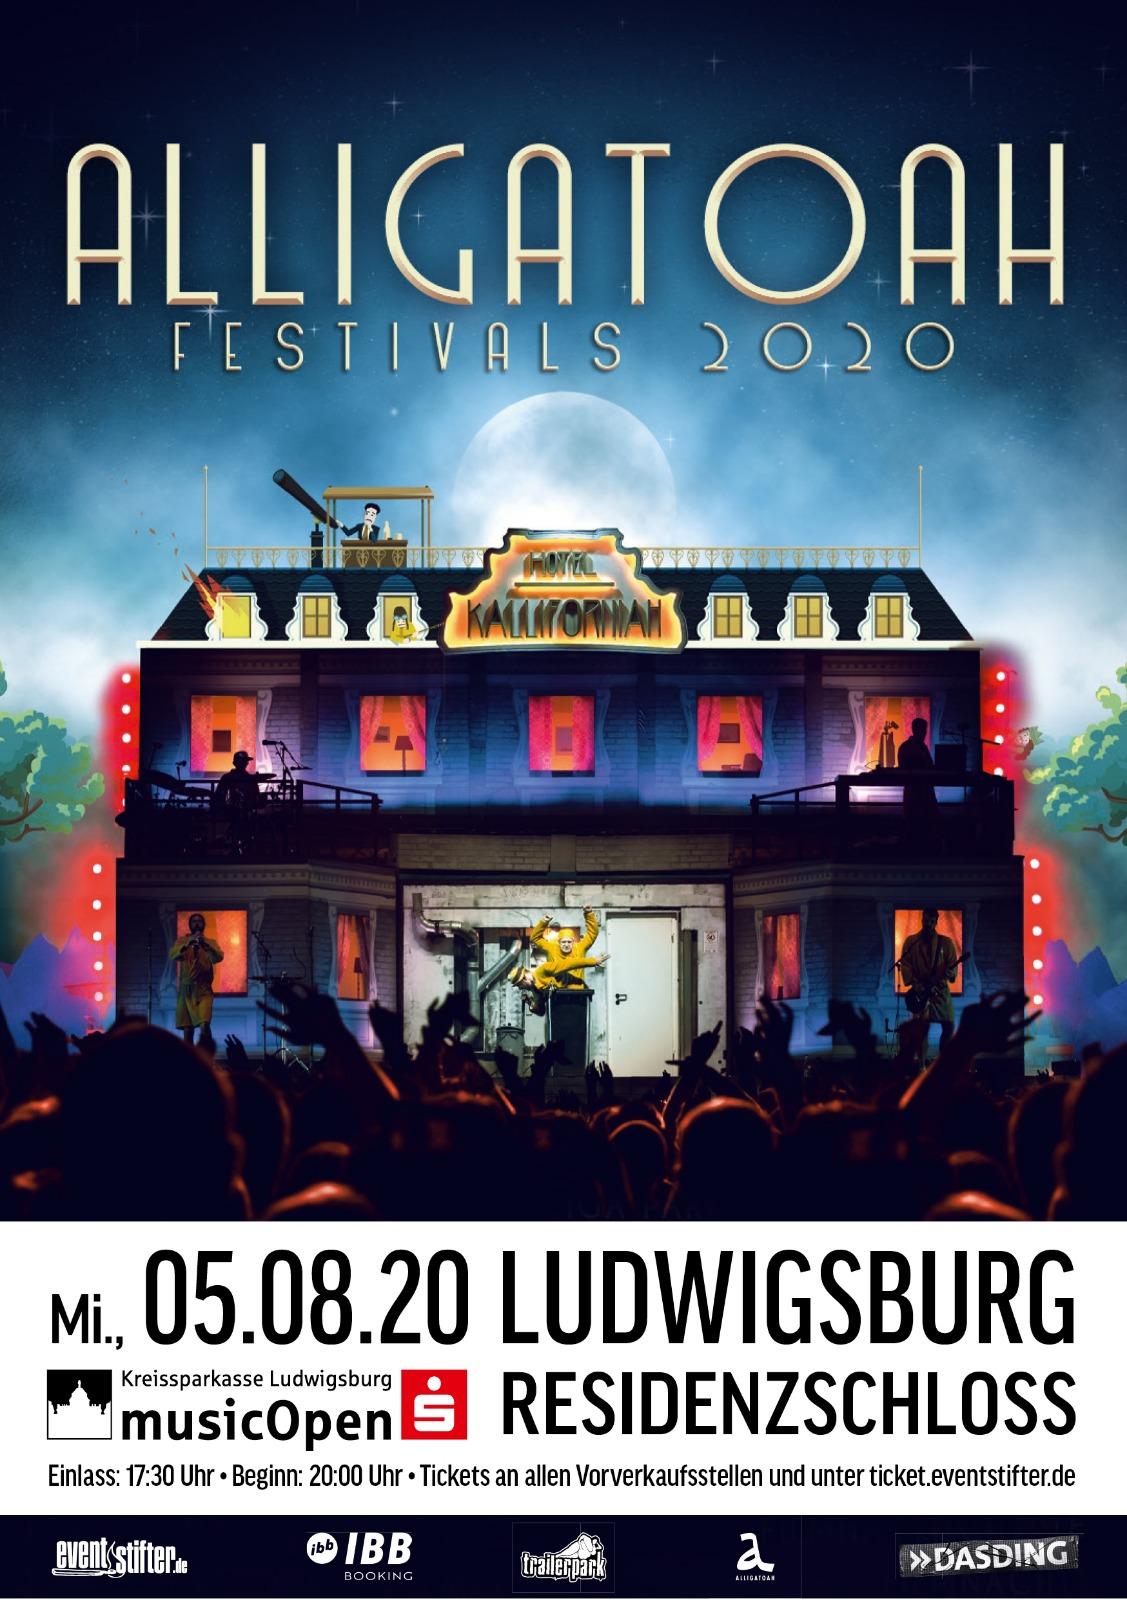 Alligatoah Tickets 2021